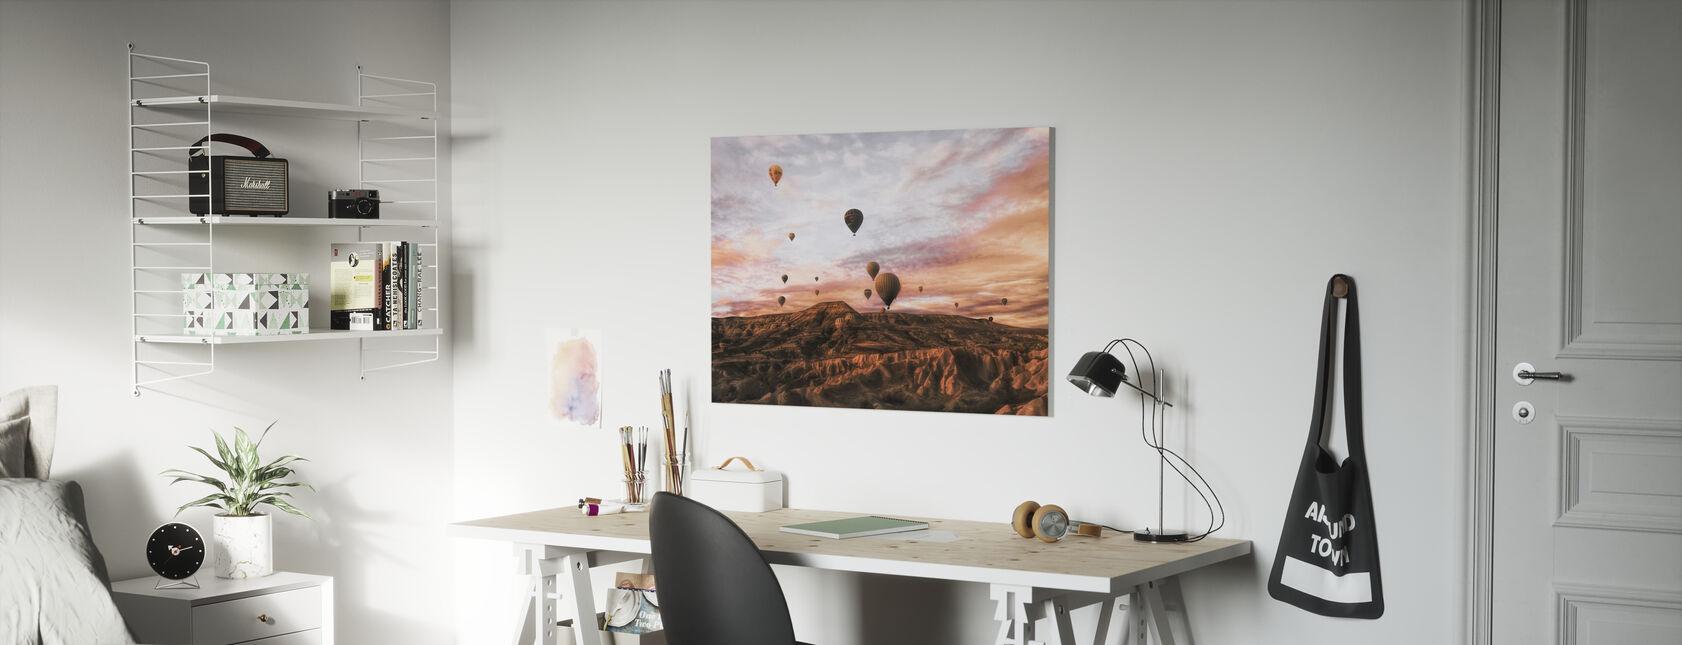 Cappodocia Heißluftballon - Leinwandbild - Kinderzimmer